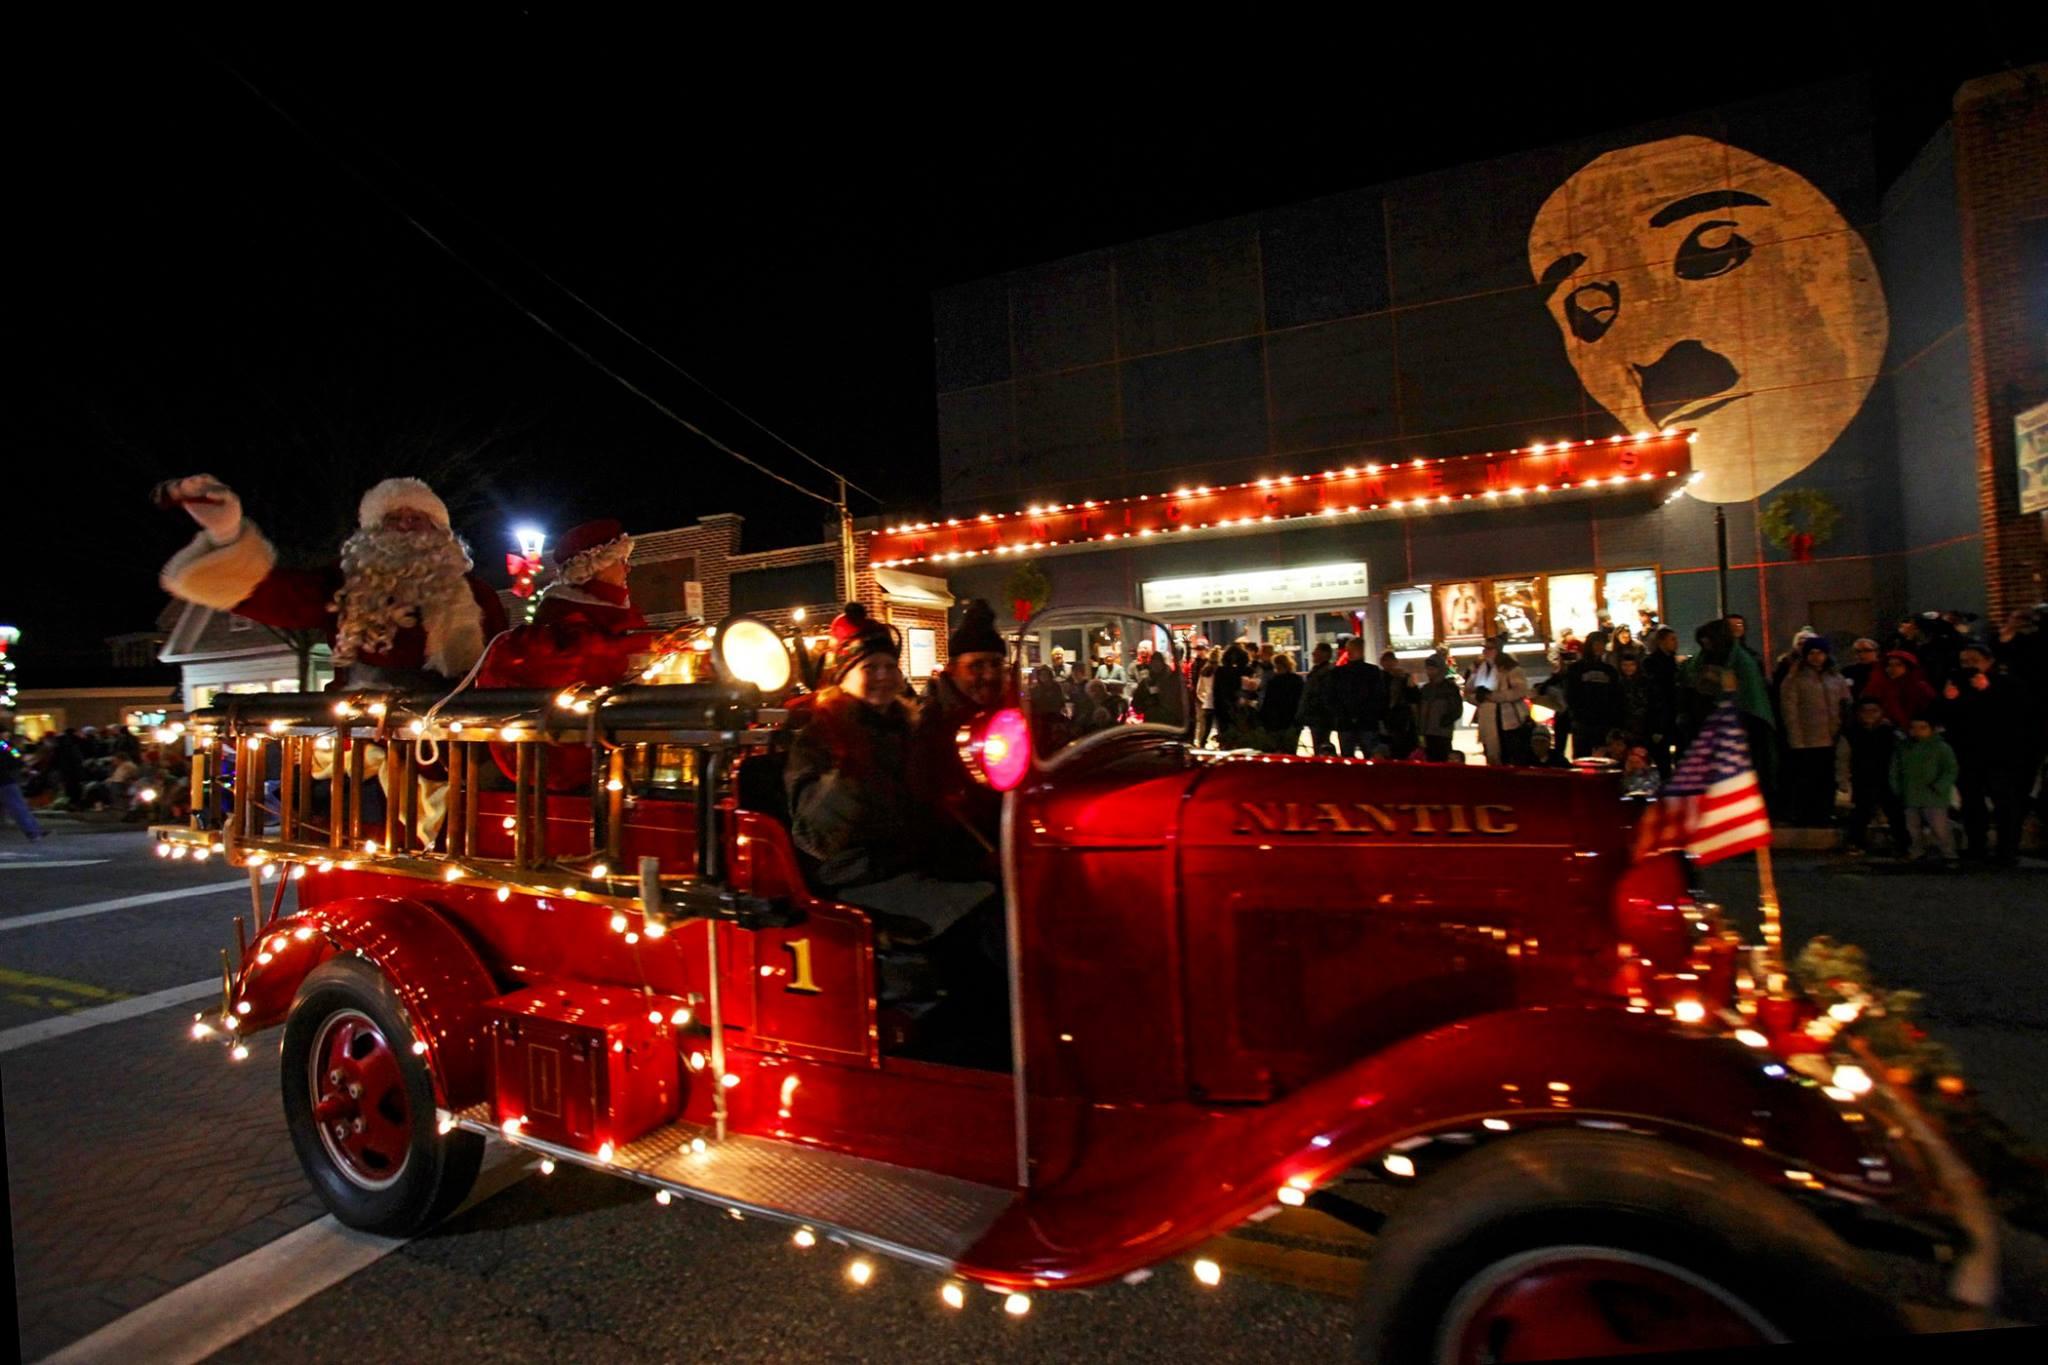 Niantic Ct Christmas Parade 2020 Niantic Light Parade | Town of East Lyme